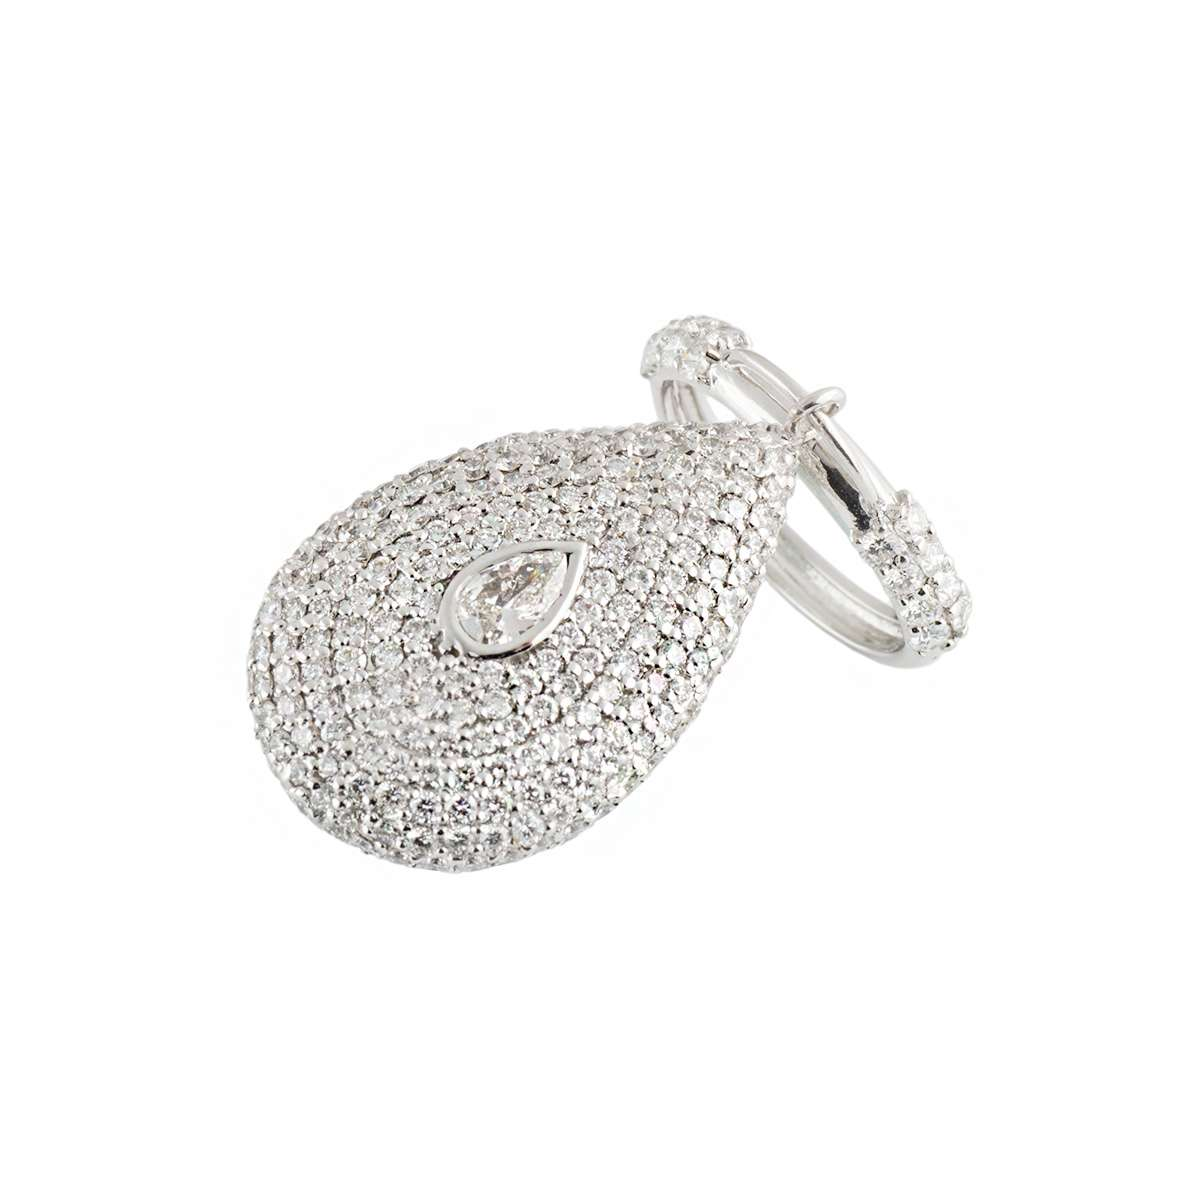 18k White Gold Diamond Set Charm Ring 5.98ct